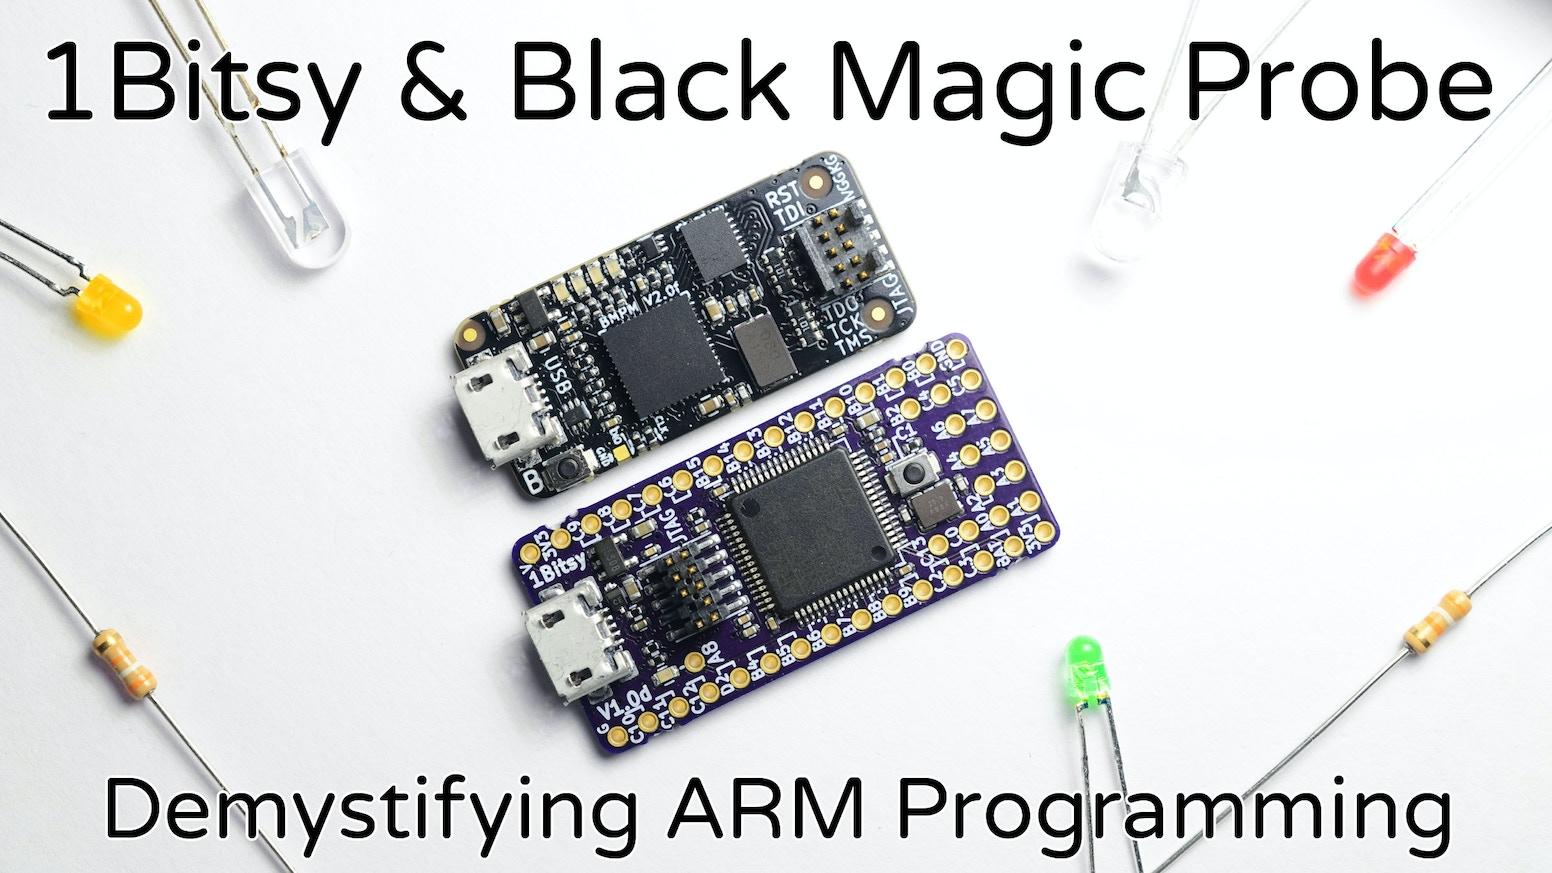 1Bitsy & Black Magic Probe - Demystifying ARM Programming by Piotr ...